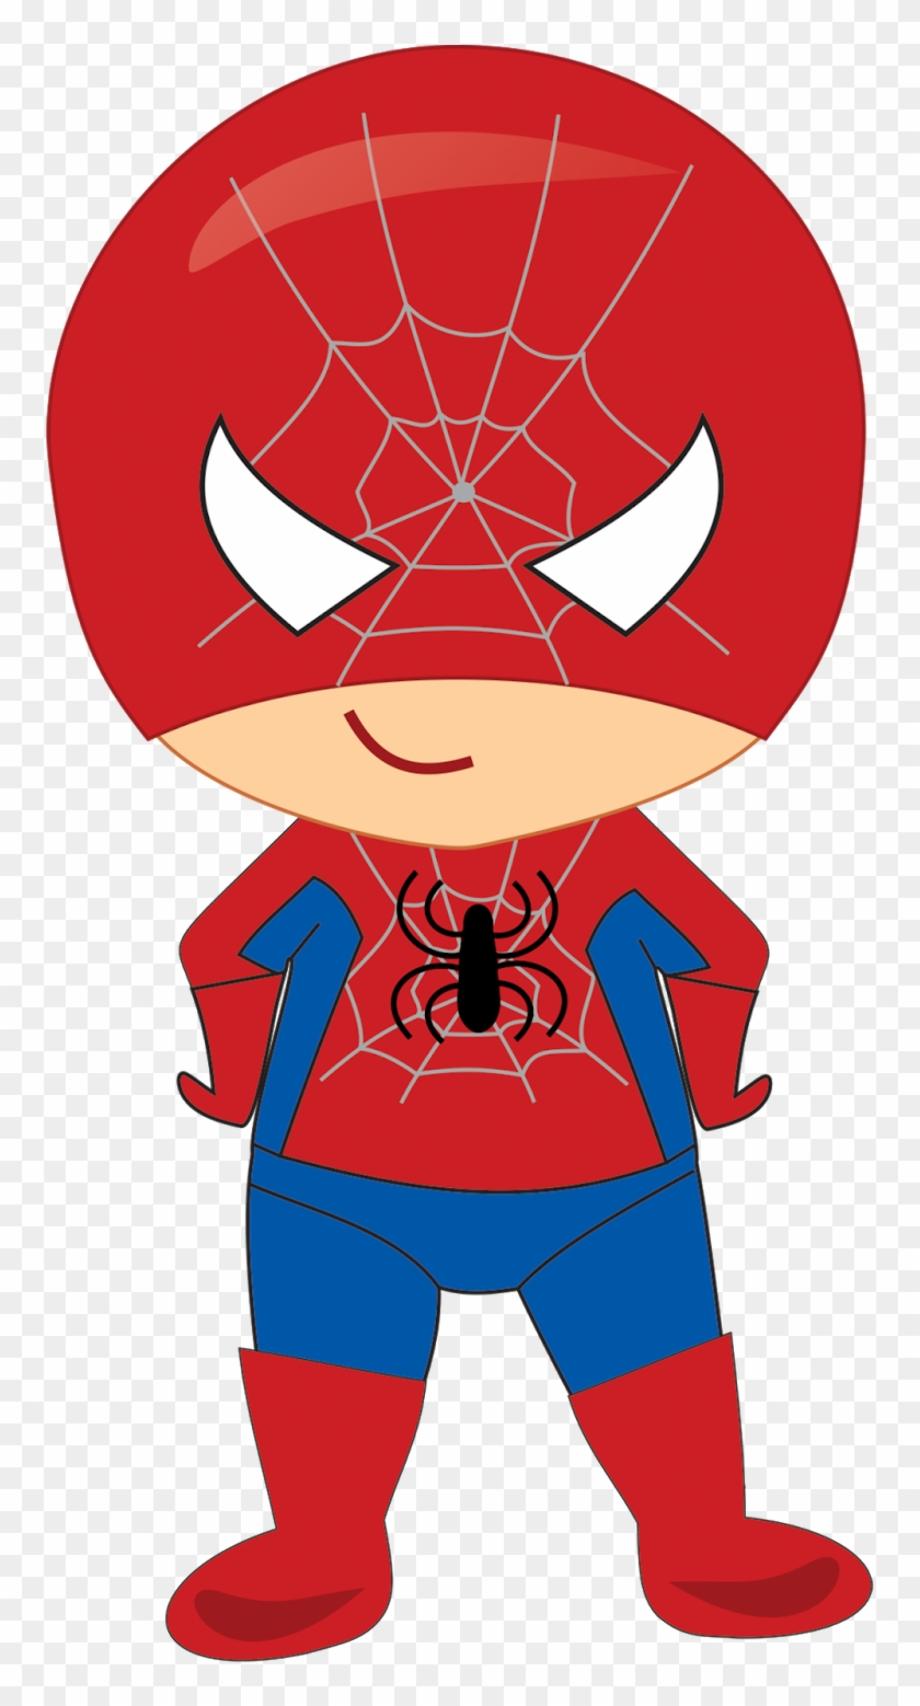 superhero clipart spiderman